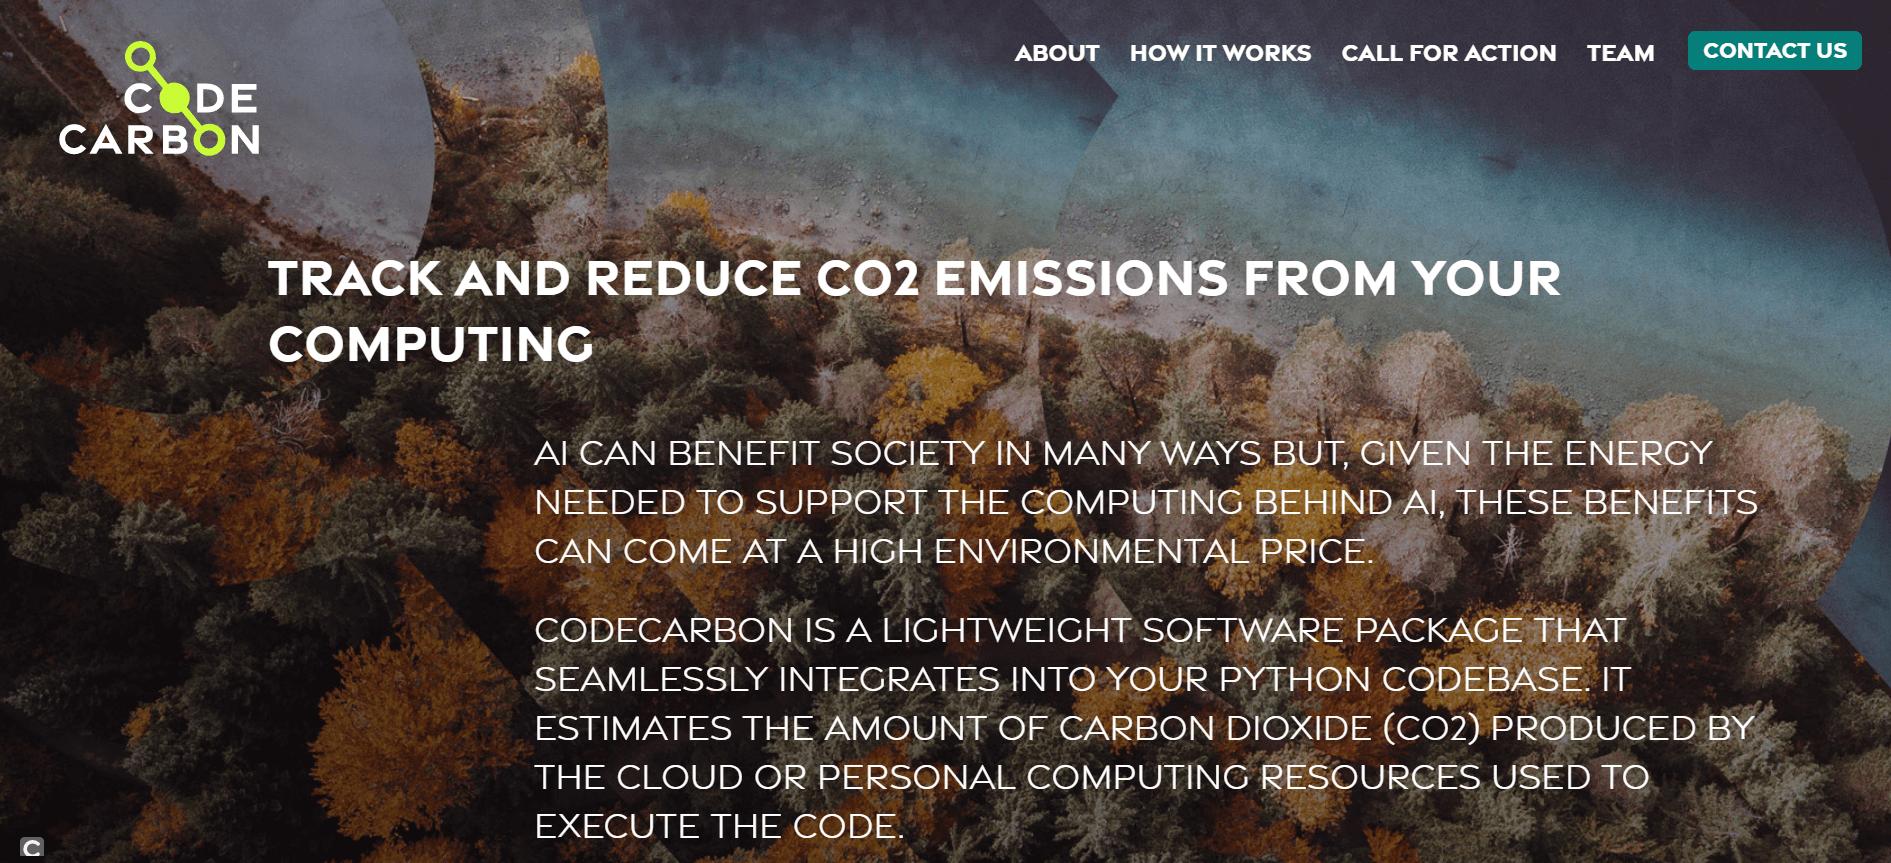 Code Carbon